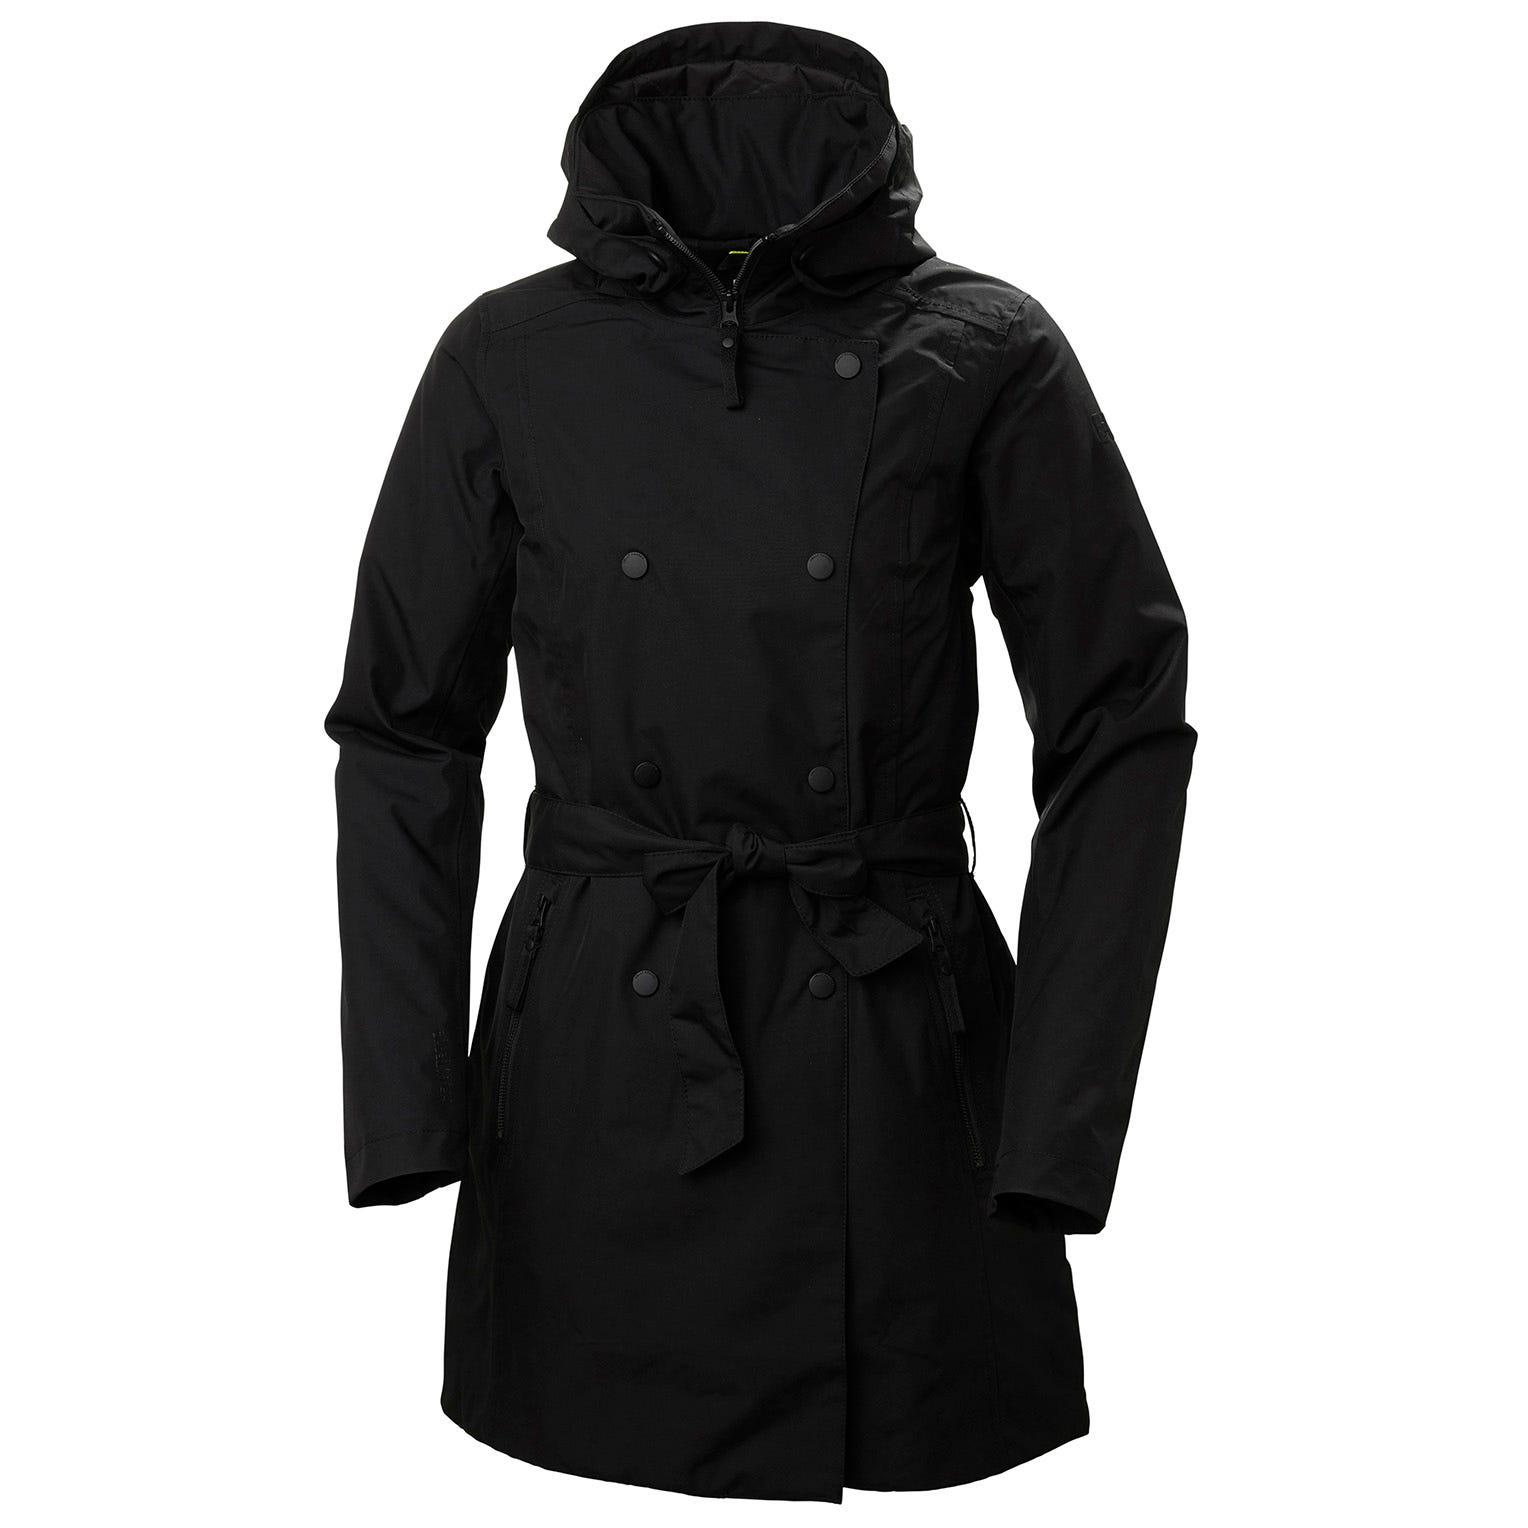 Womens Welsey Ii Insulated Trench Coat | Helly Hansen Womens Rain Jacket Black S